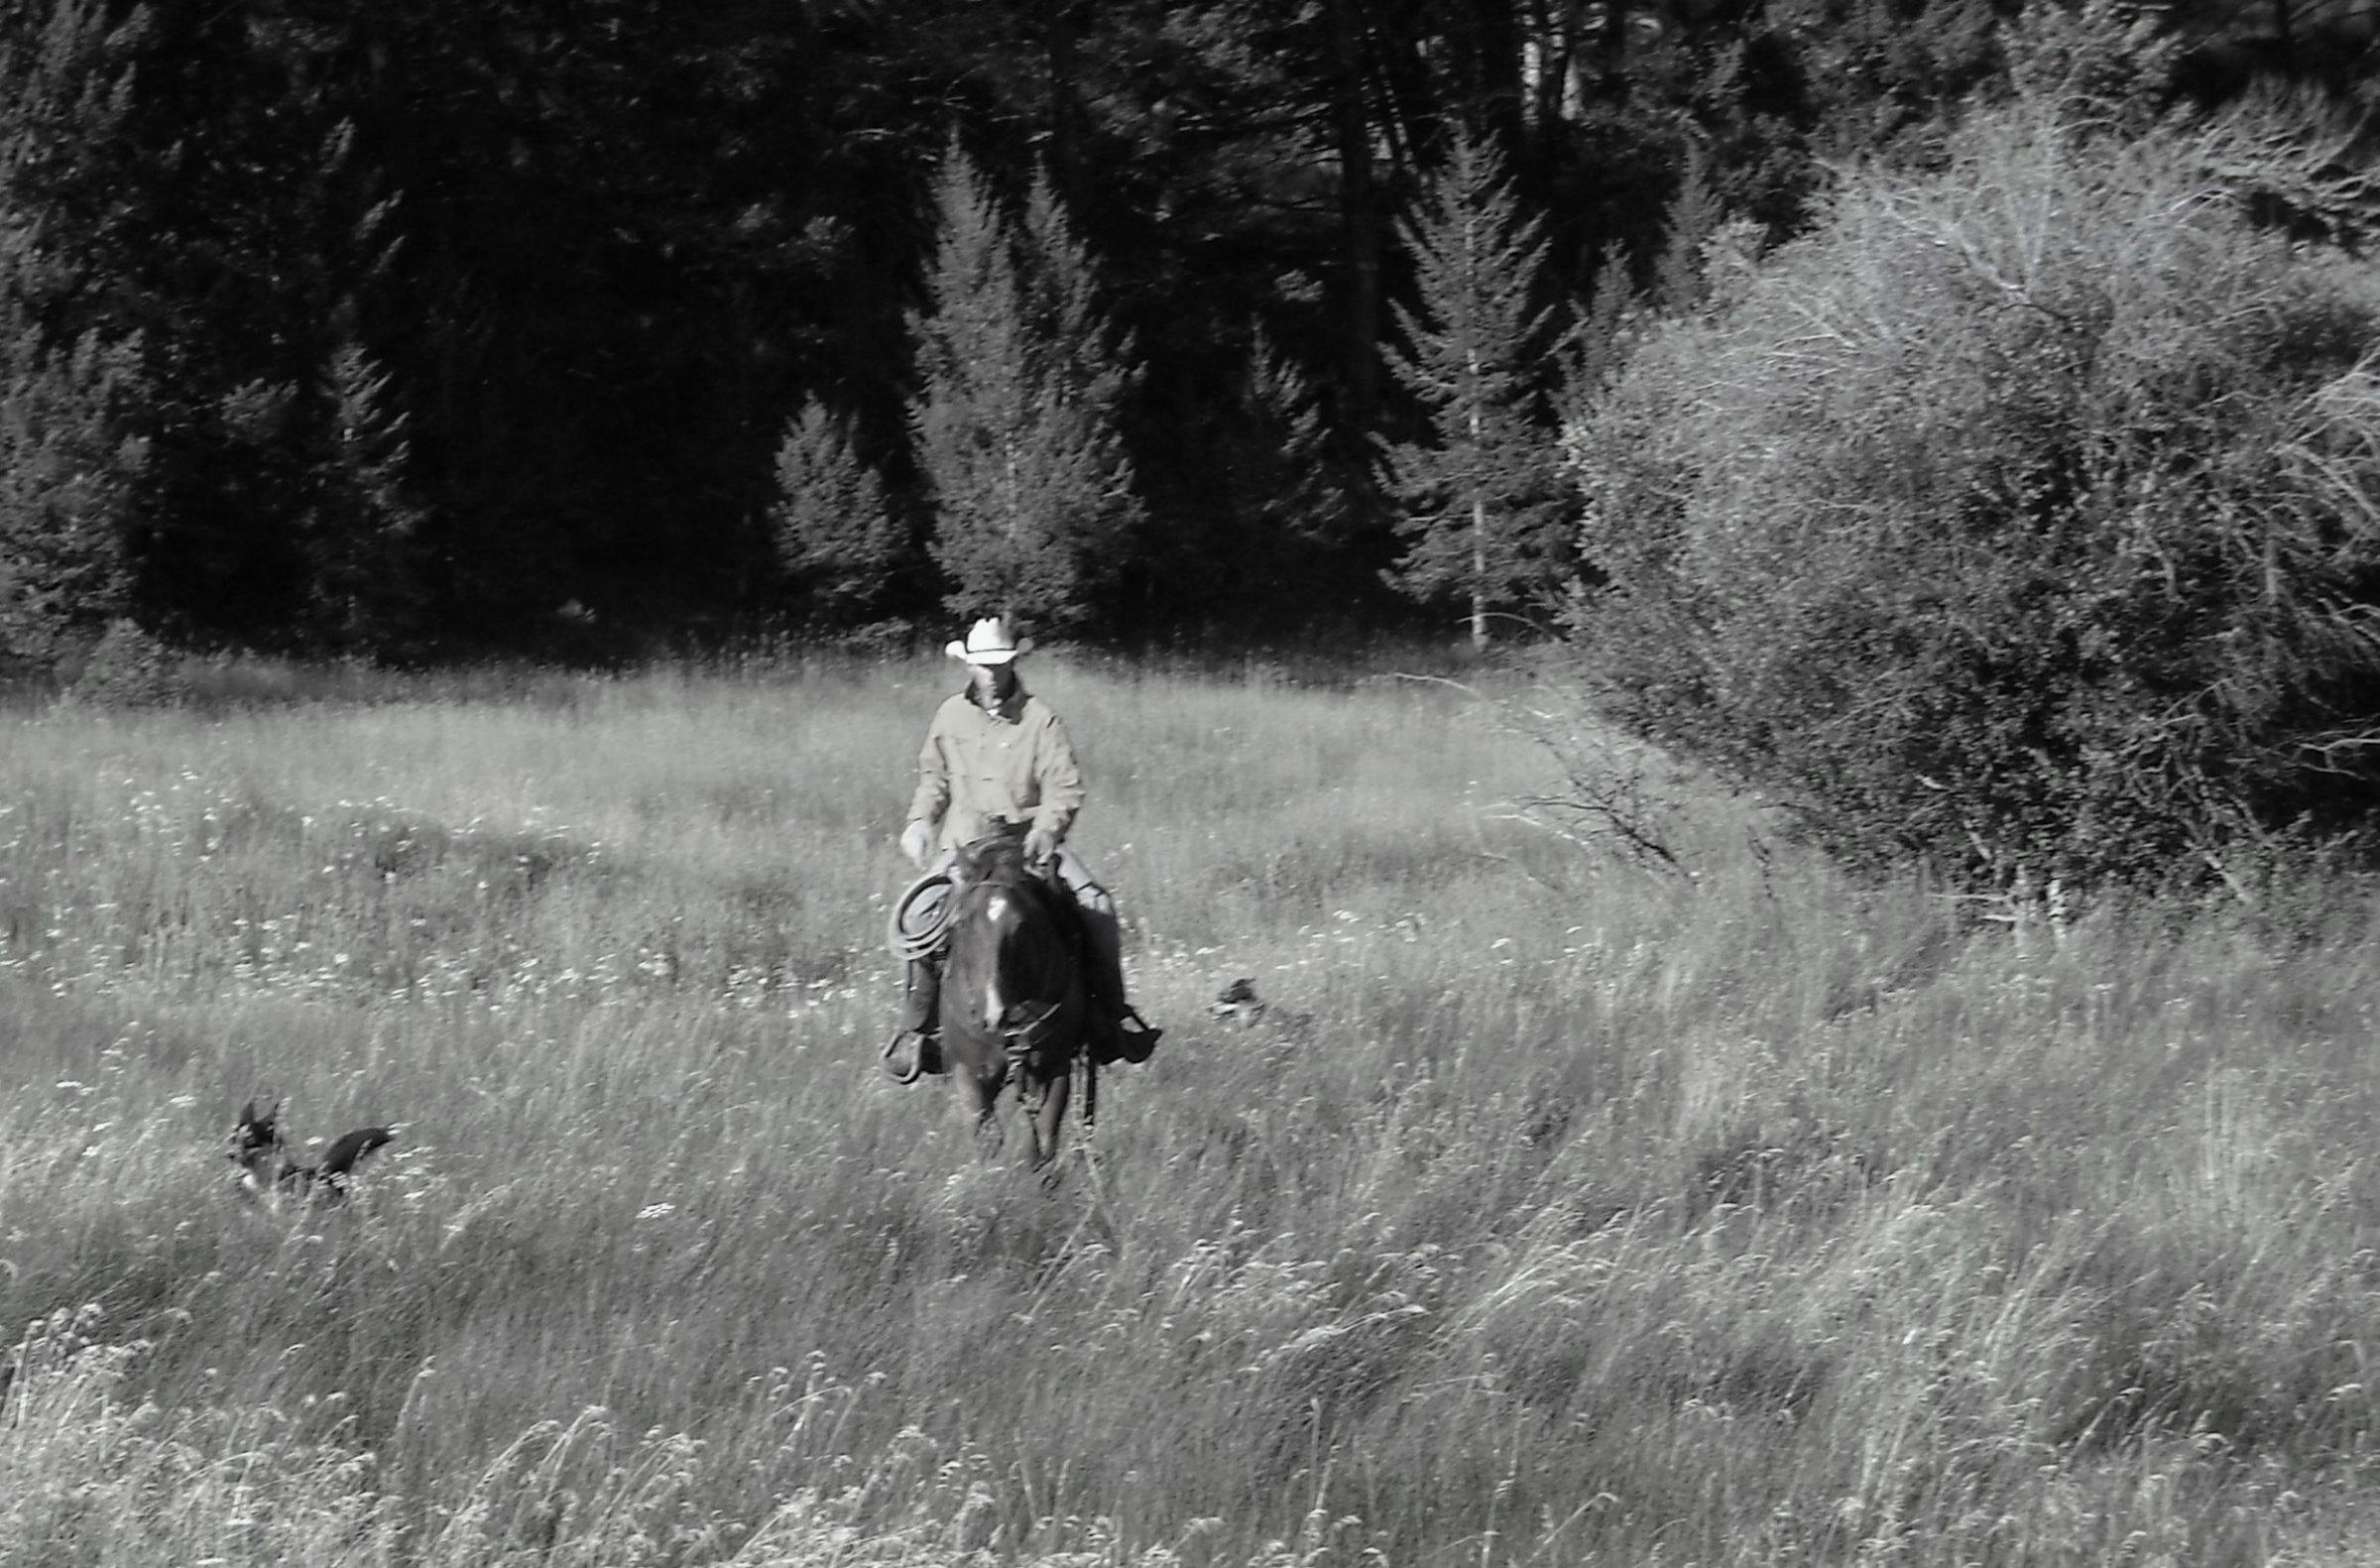 riding - lone rider (2)